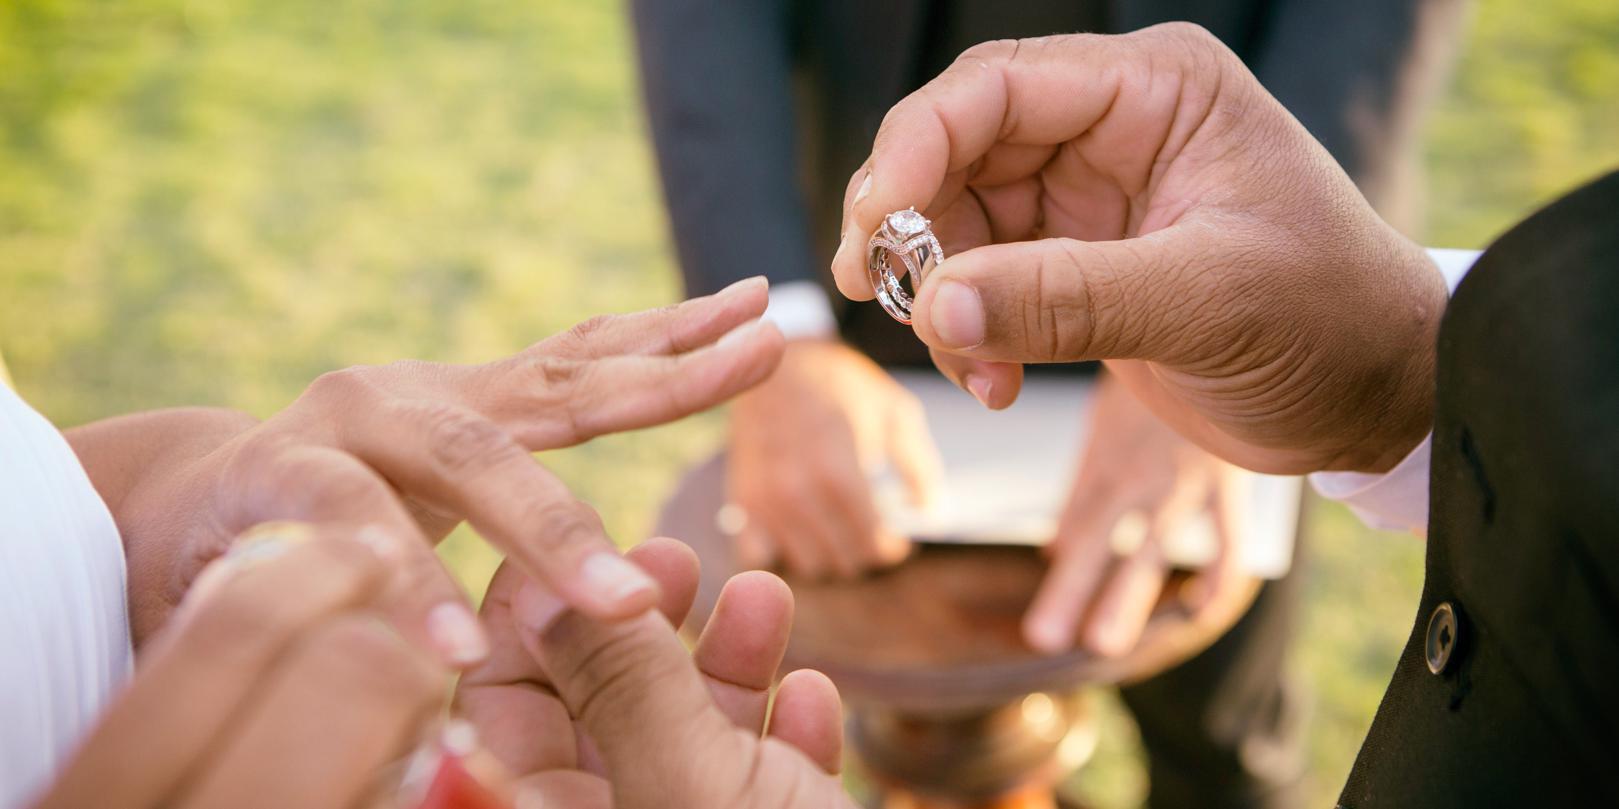 bodas-sin-clasificar-sin-tema-cuba-42181.jpg